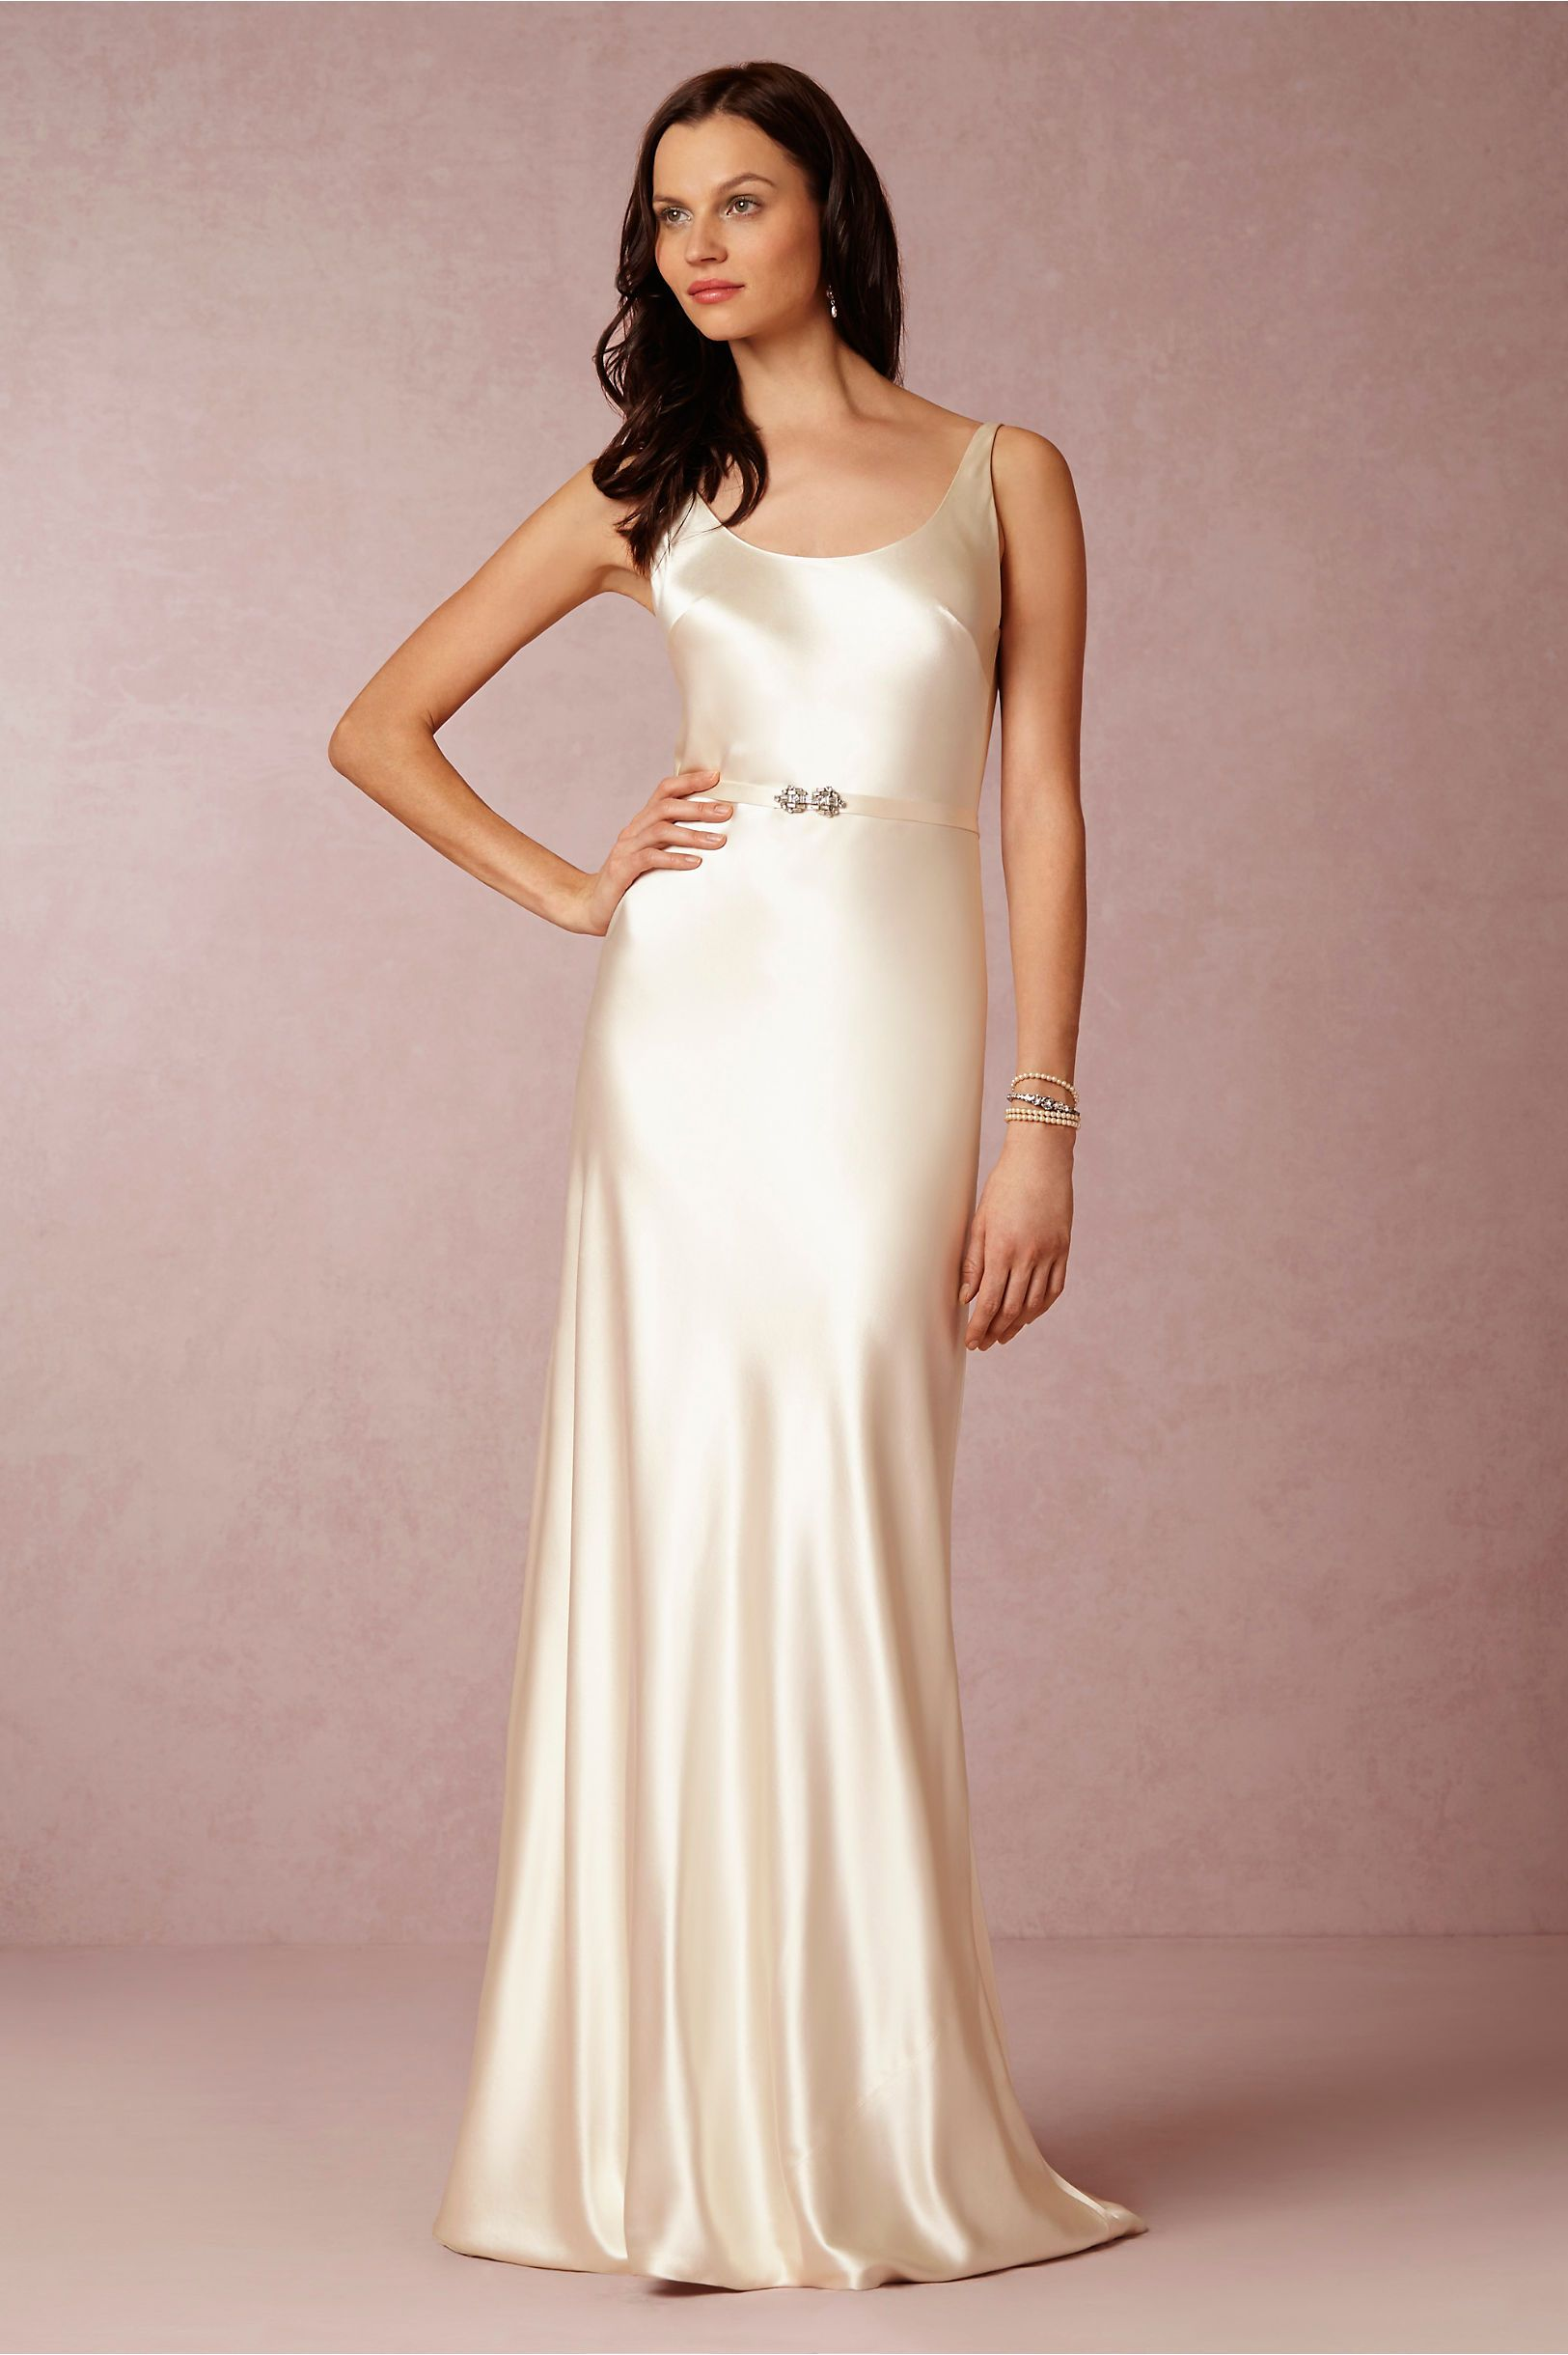 Marlowe Gown by Johanna Johnson for @BHLDN   Black Tie Wedding ...